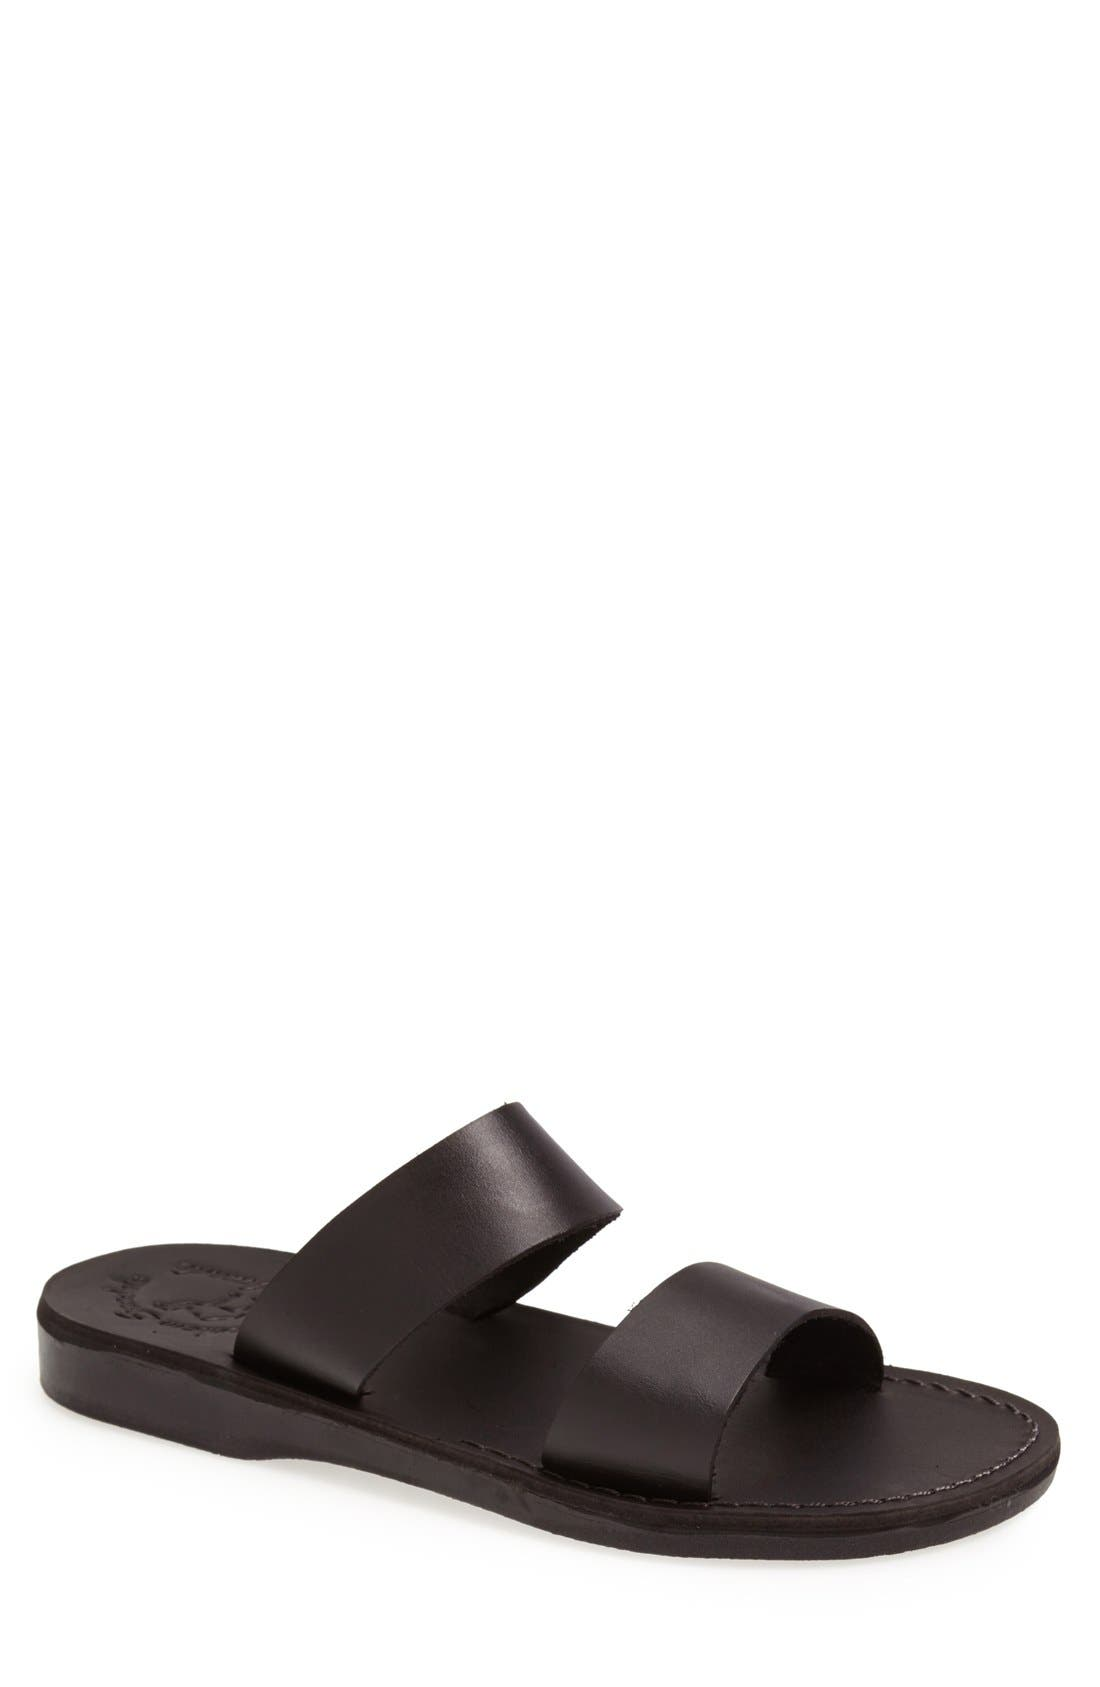 JERUSALEM SANDALS, 'Aviv' Leather Sandal, Main thumbnail 1, color, BLACK